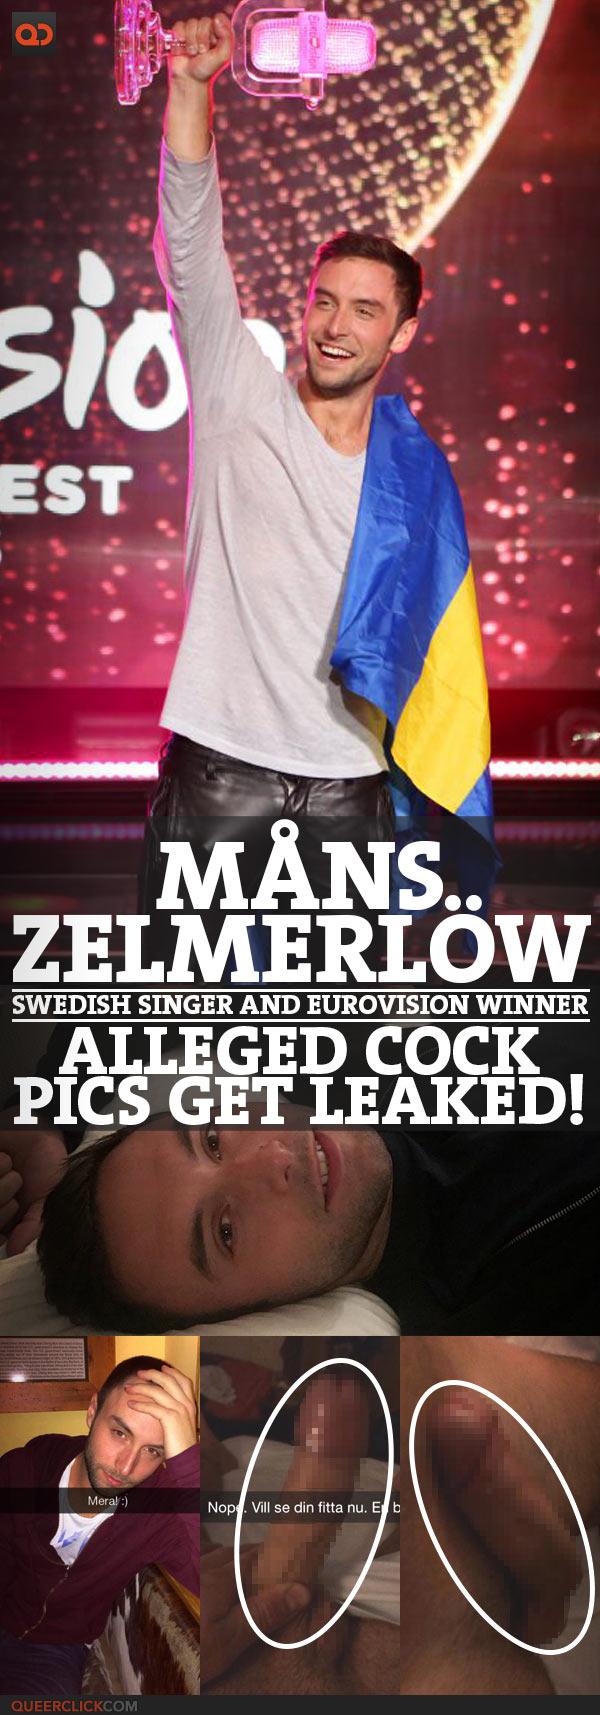 Måns Zelmerlöw, Swedish Singer And EuroVision Winner, Alleged Cock Pic Get Leaked!